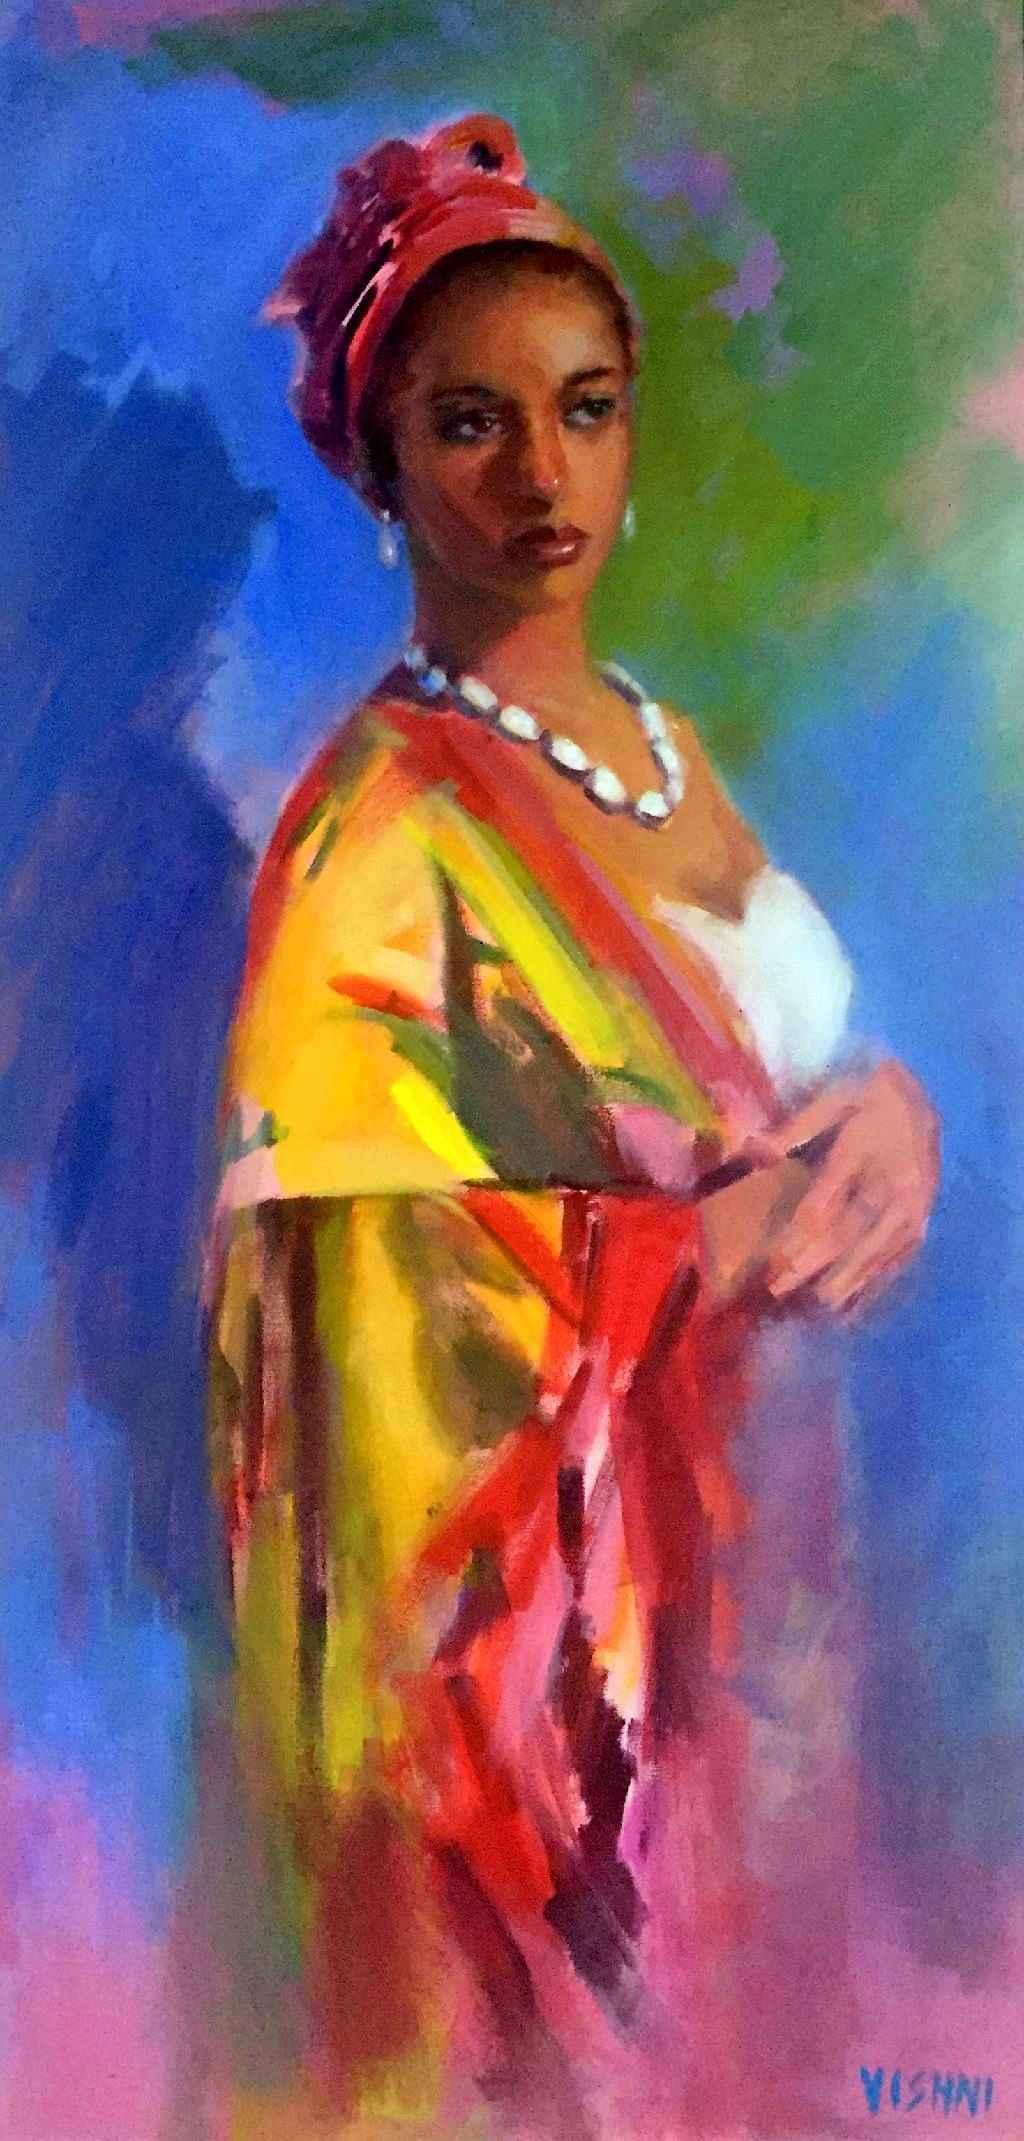 Regal Look by Mrs. Vishni Gopwani - Masterpiece Online